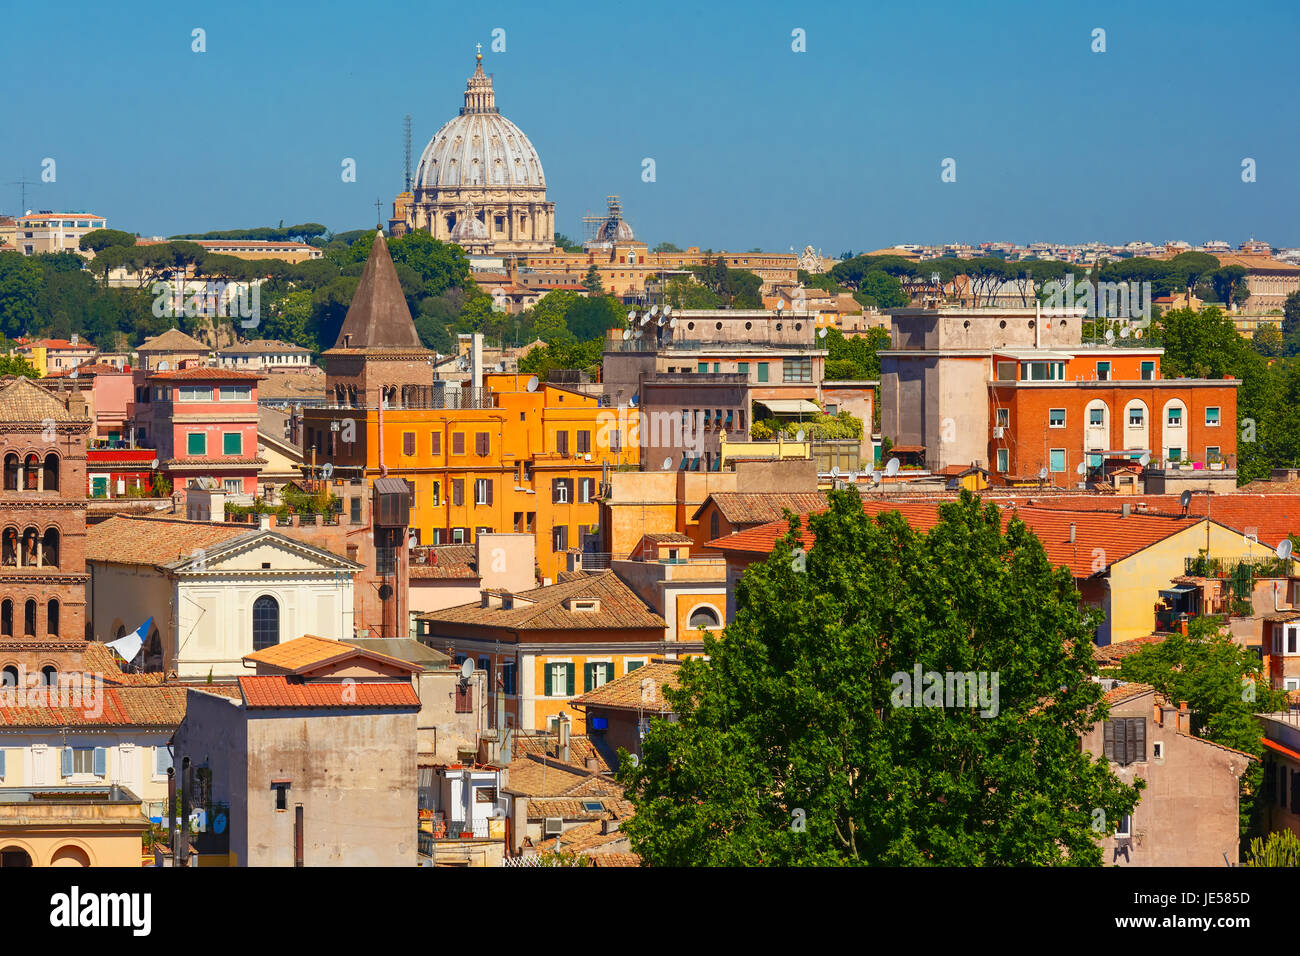 Luftaufnahme von Rom, Italien Stockbild